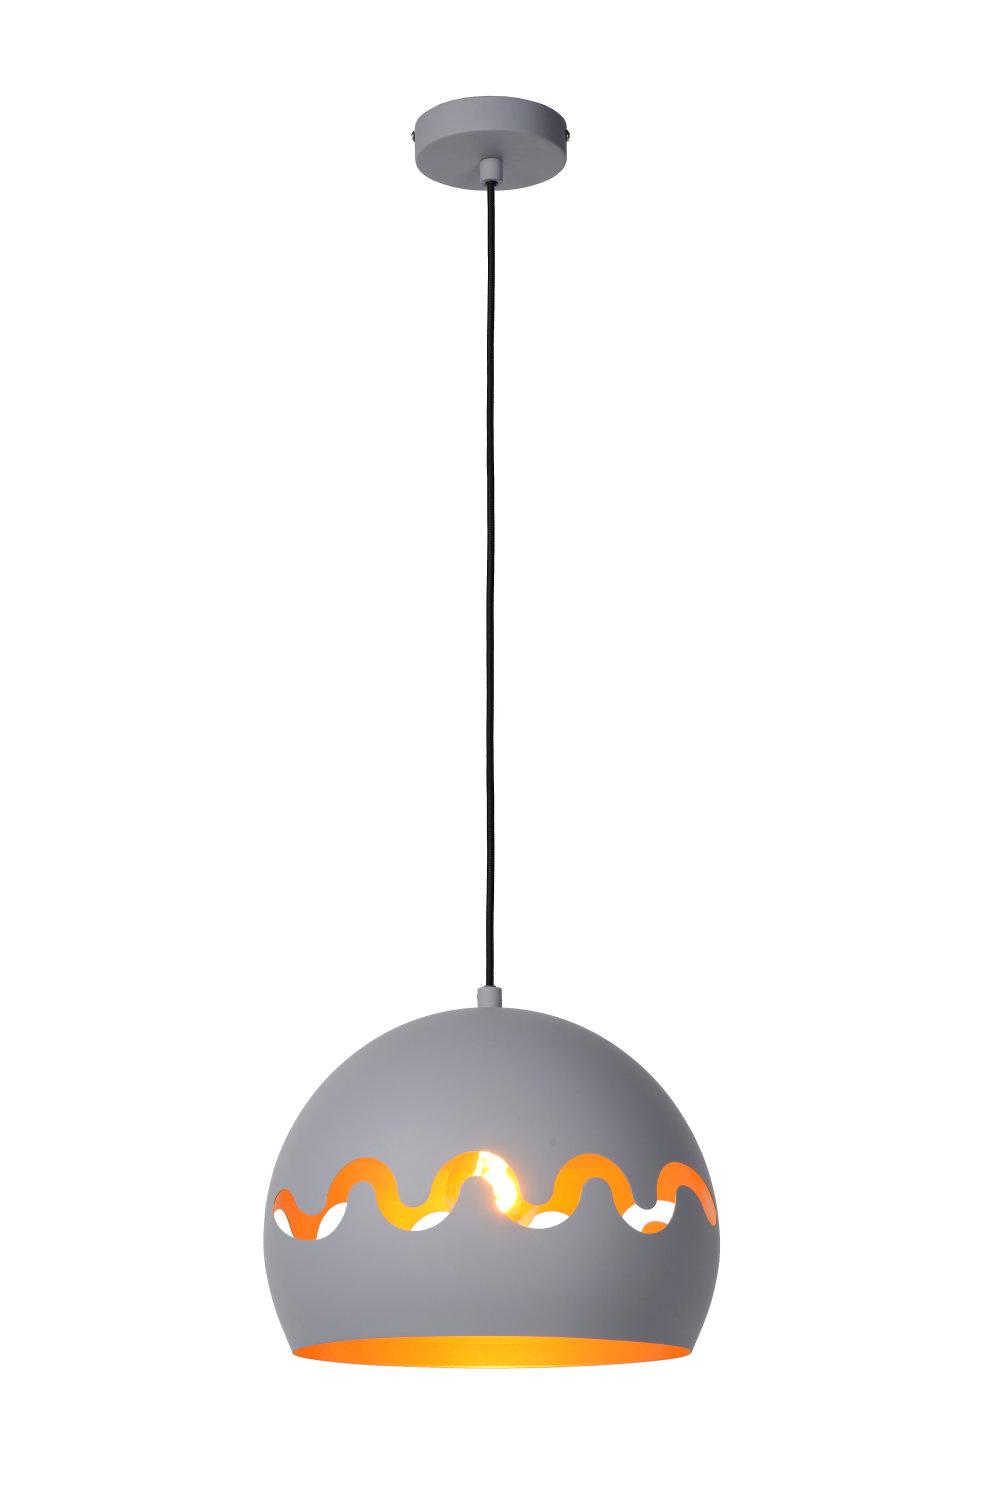 Lucide CORENTIN Hanglamp Kinder-Grijs-Ø28-1xE27-60W-IP21